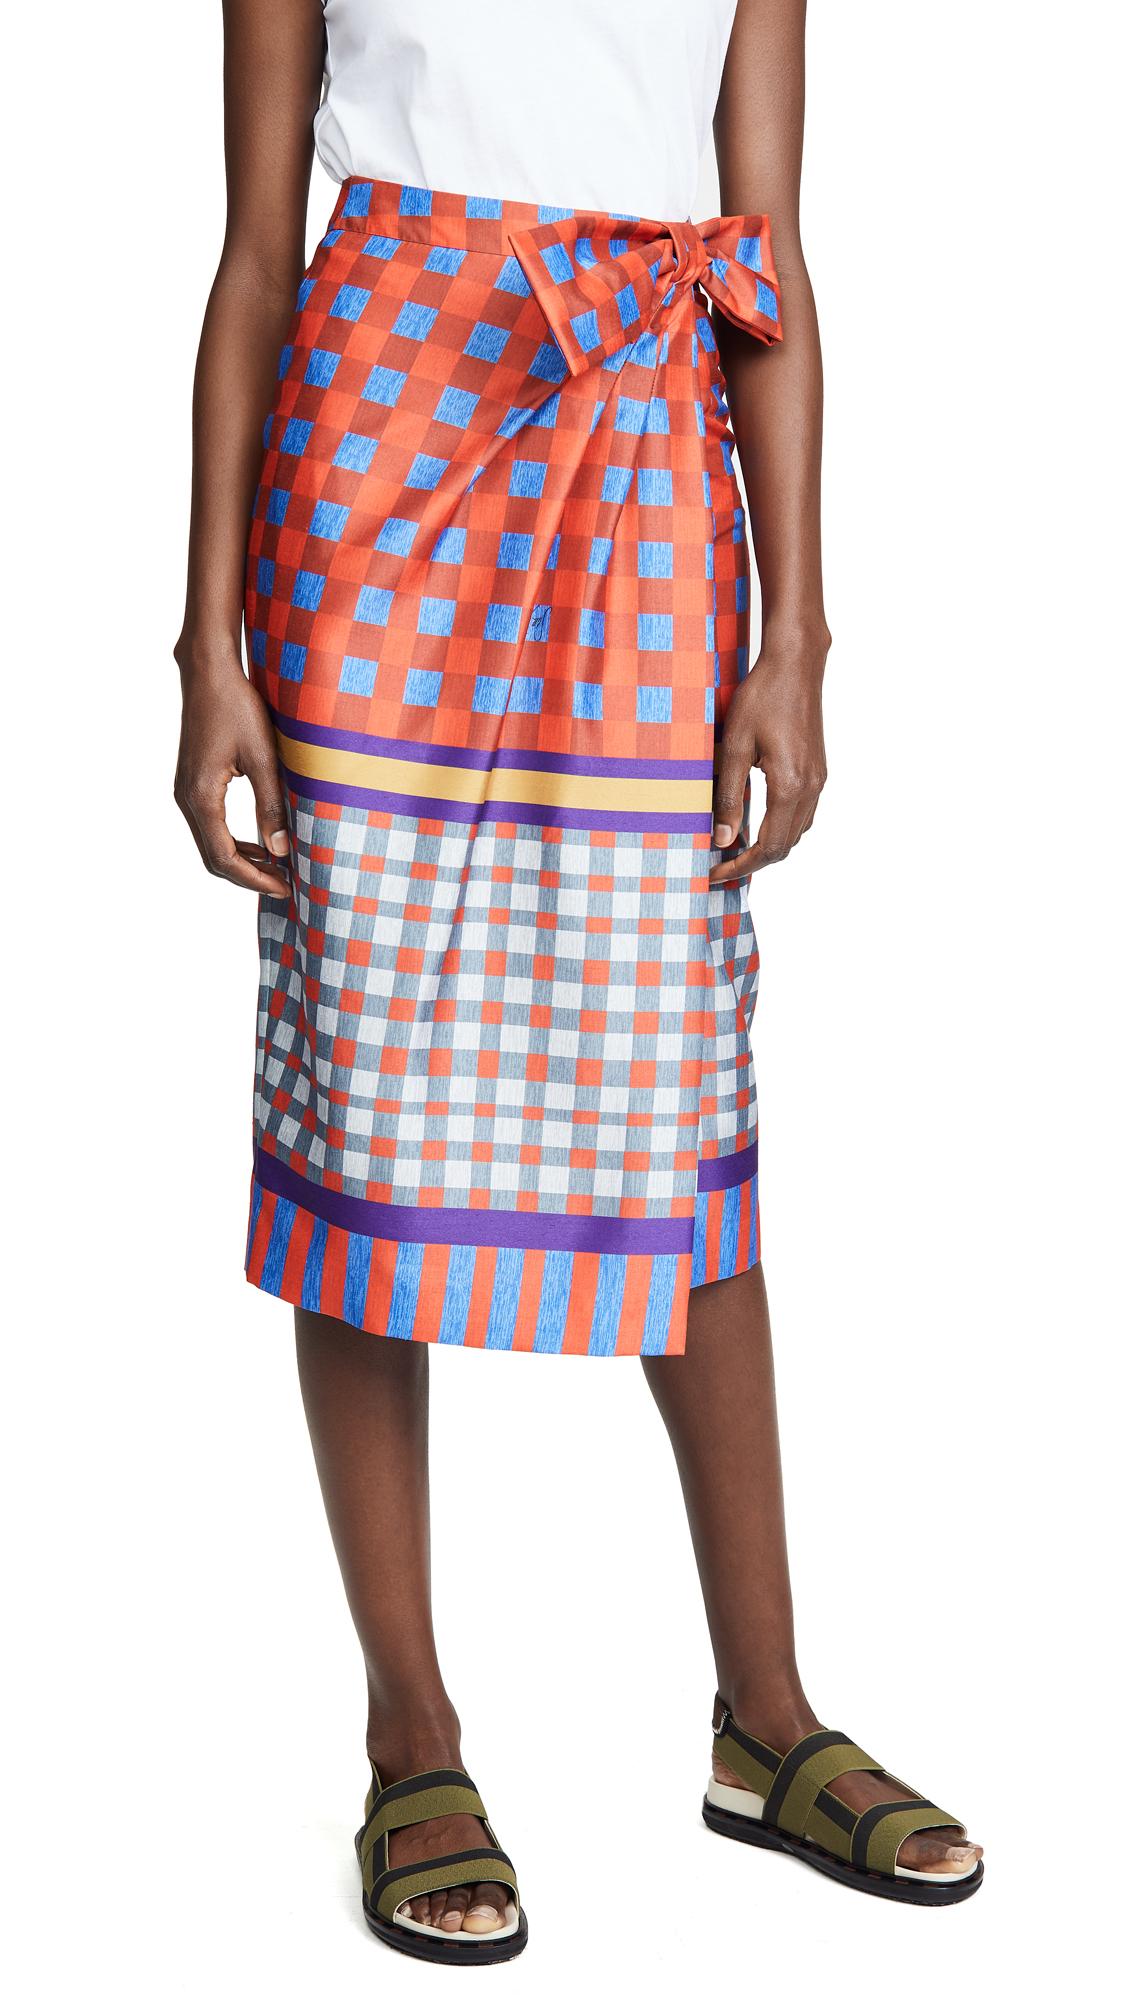 Stella Jean Geometric Wrap Skirt In Red/Blue